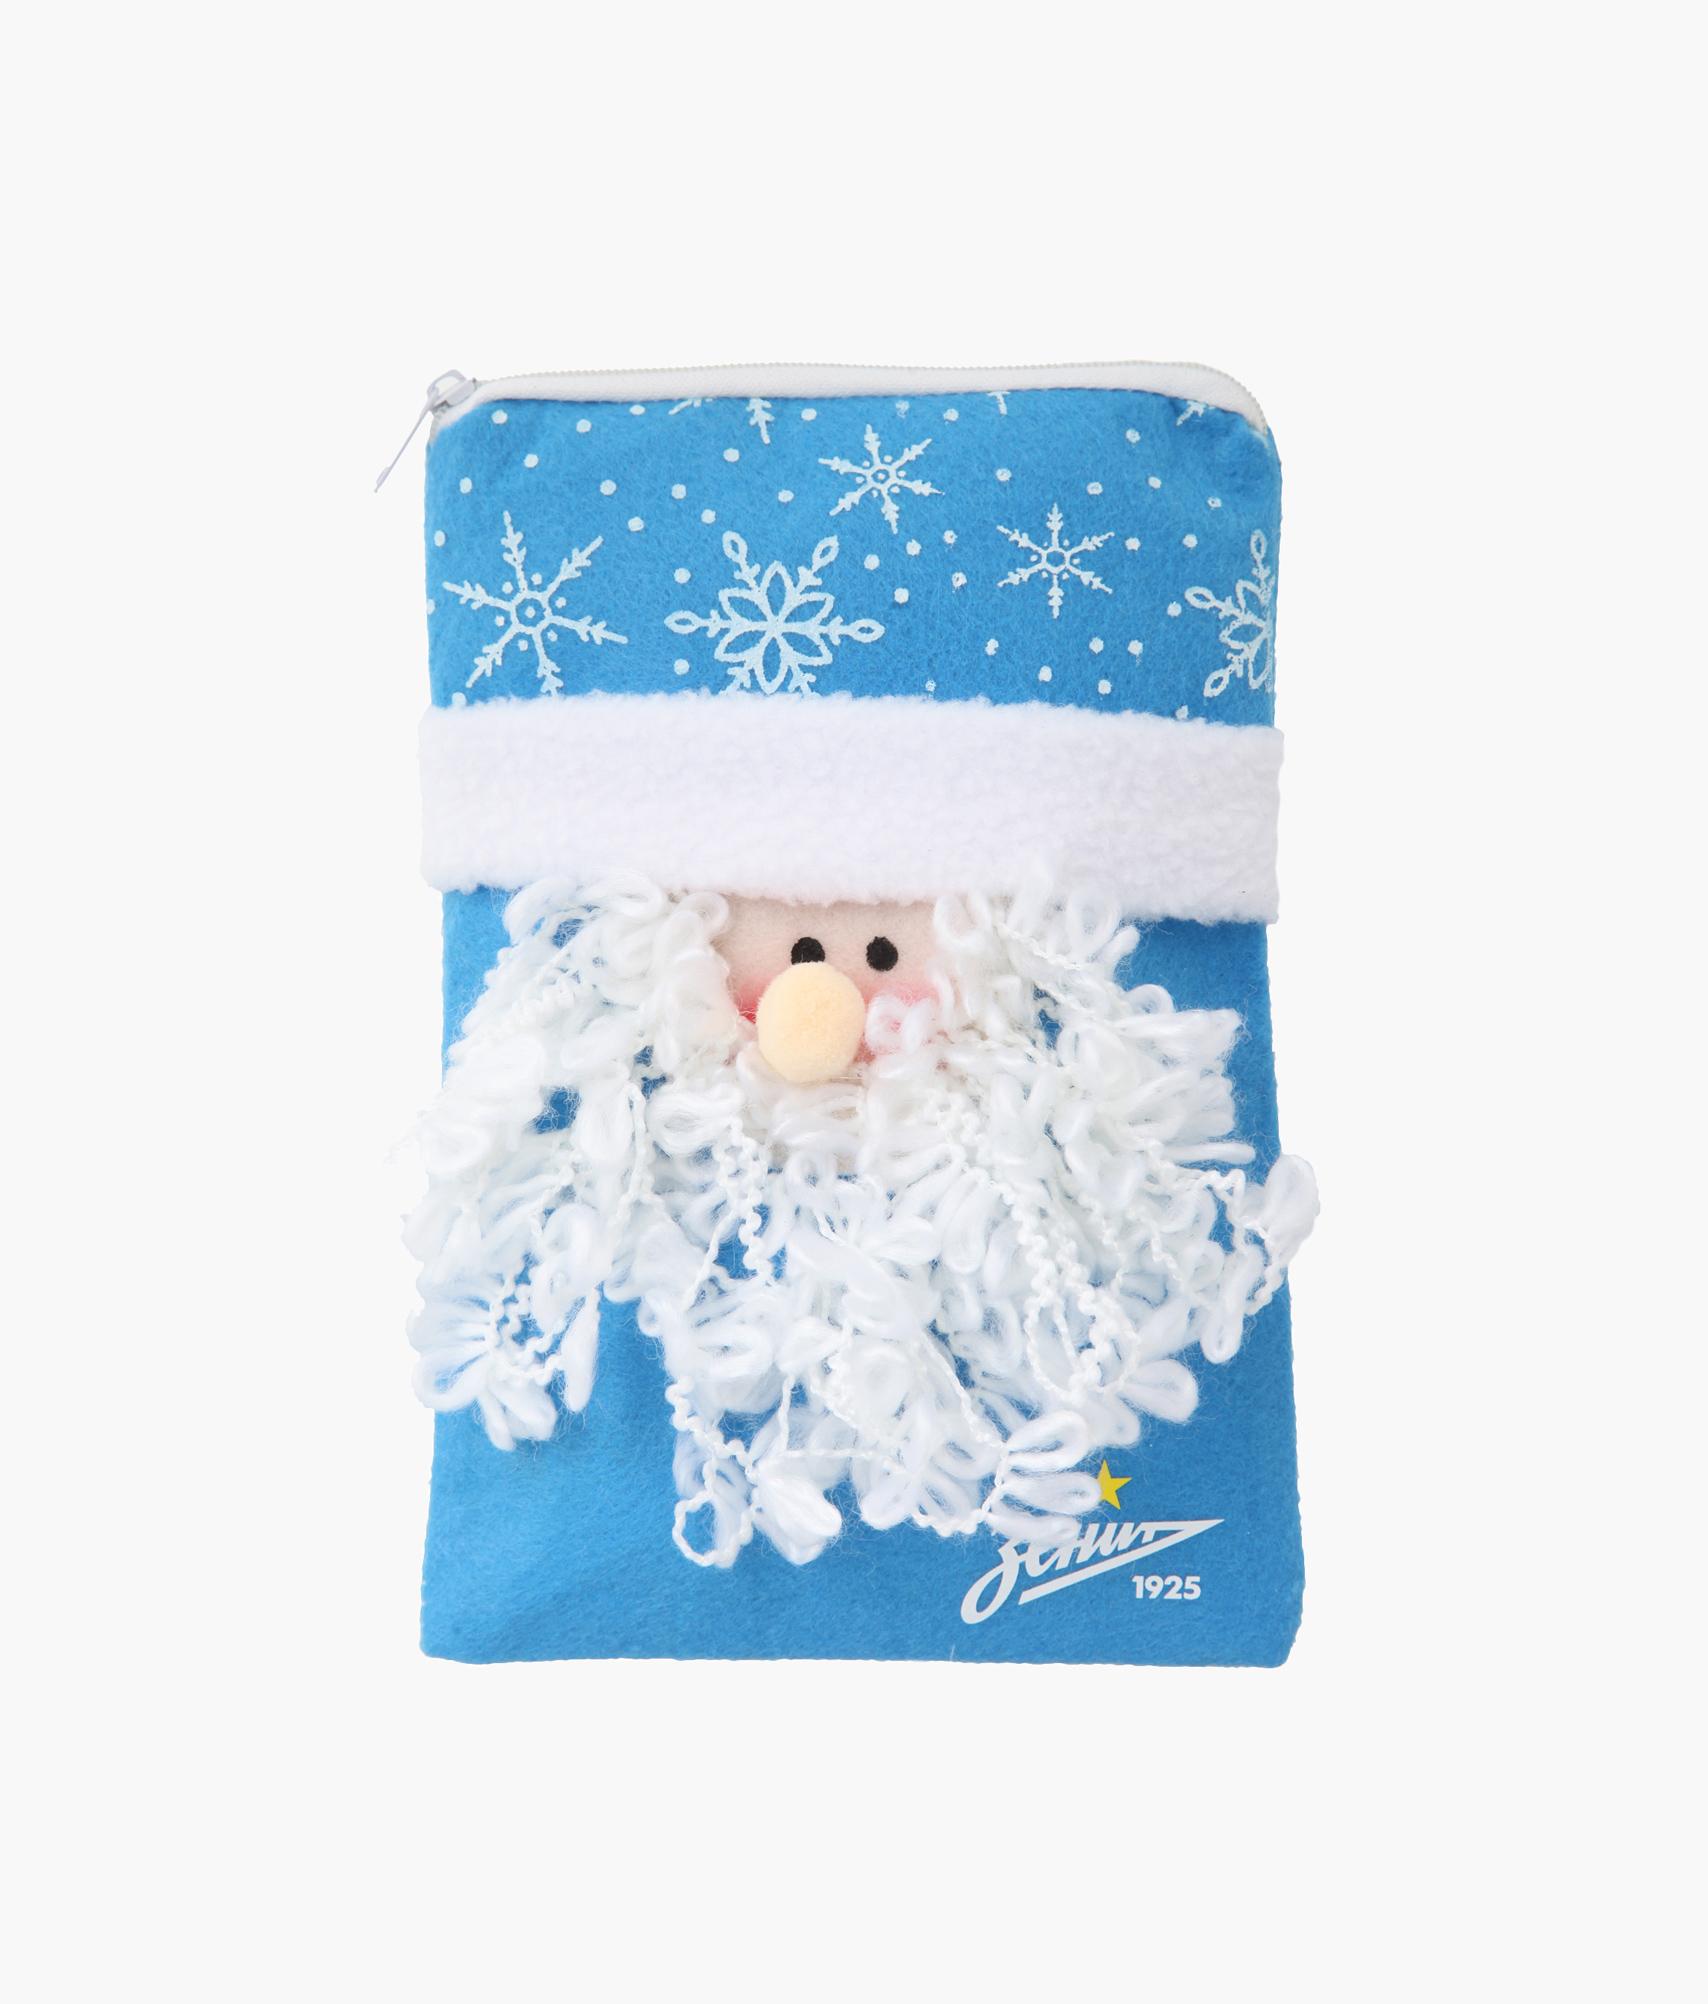 Сумочка «Дед Мороз» Зенит аксессуар для игровой консоли rainbo накладки на стики для геймпада зенит